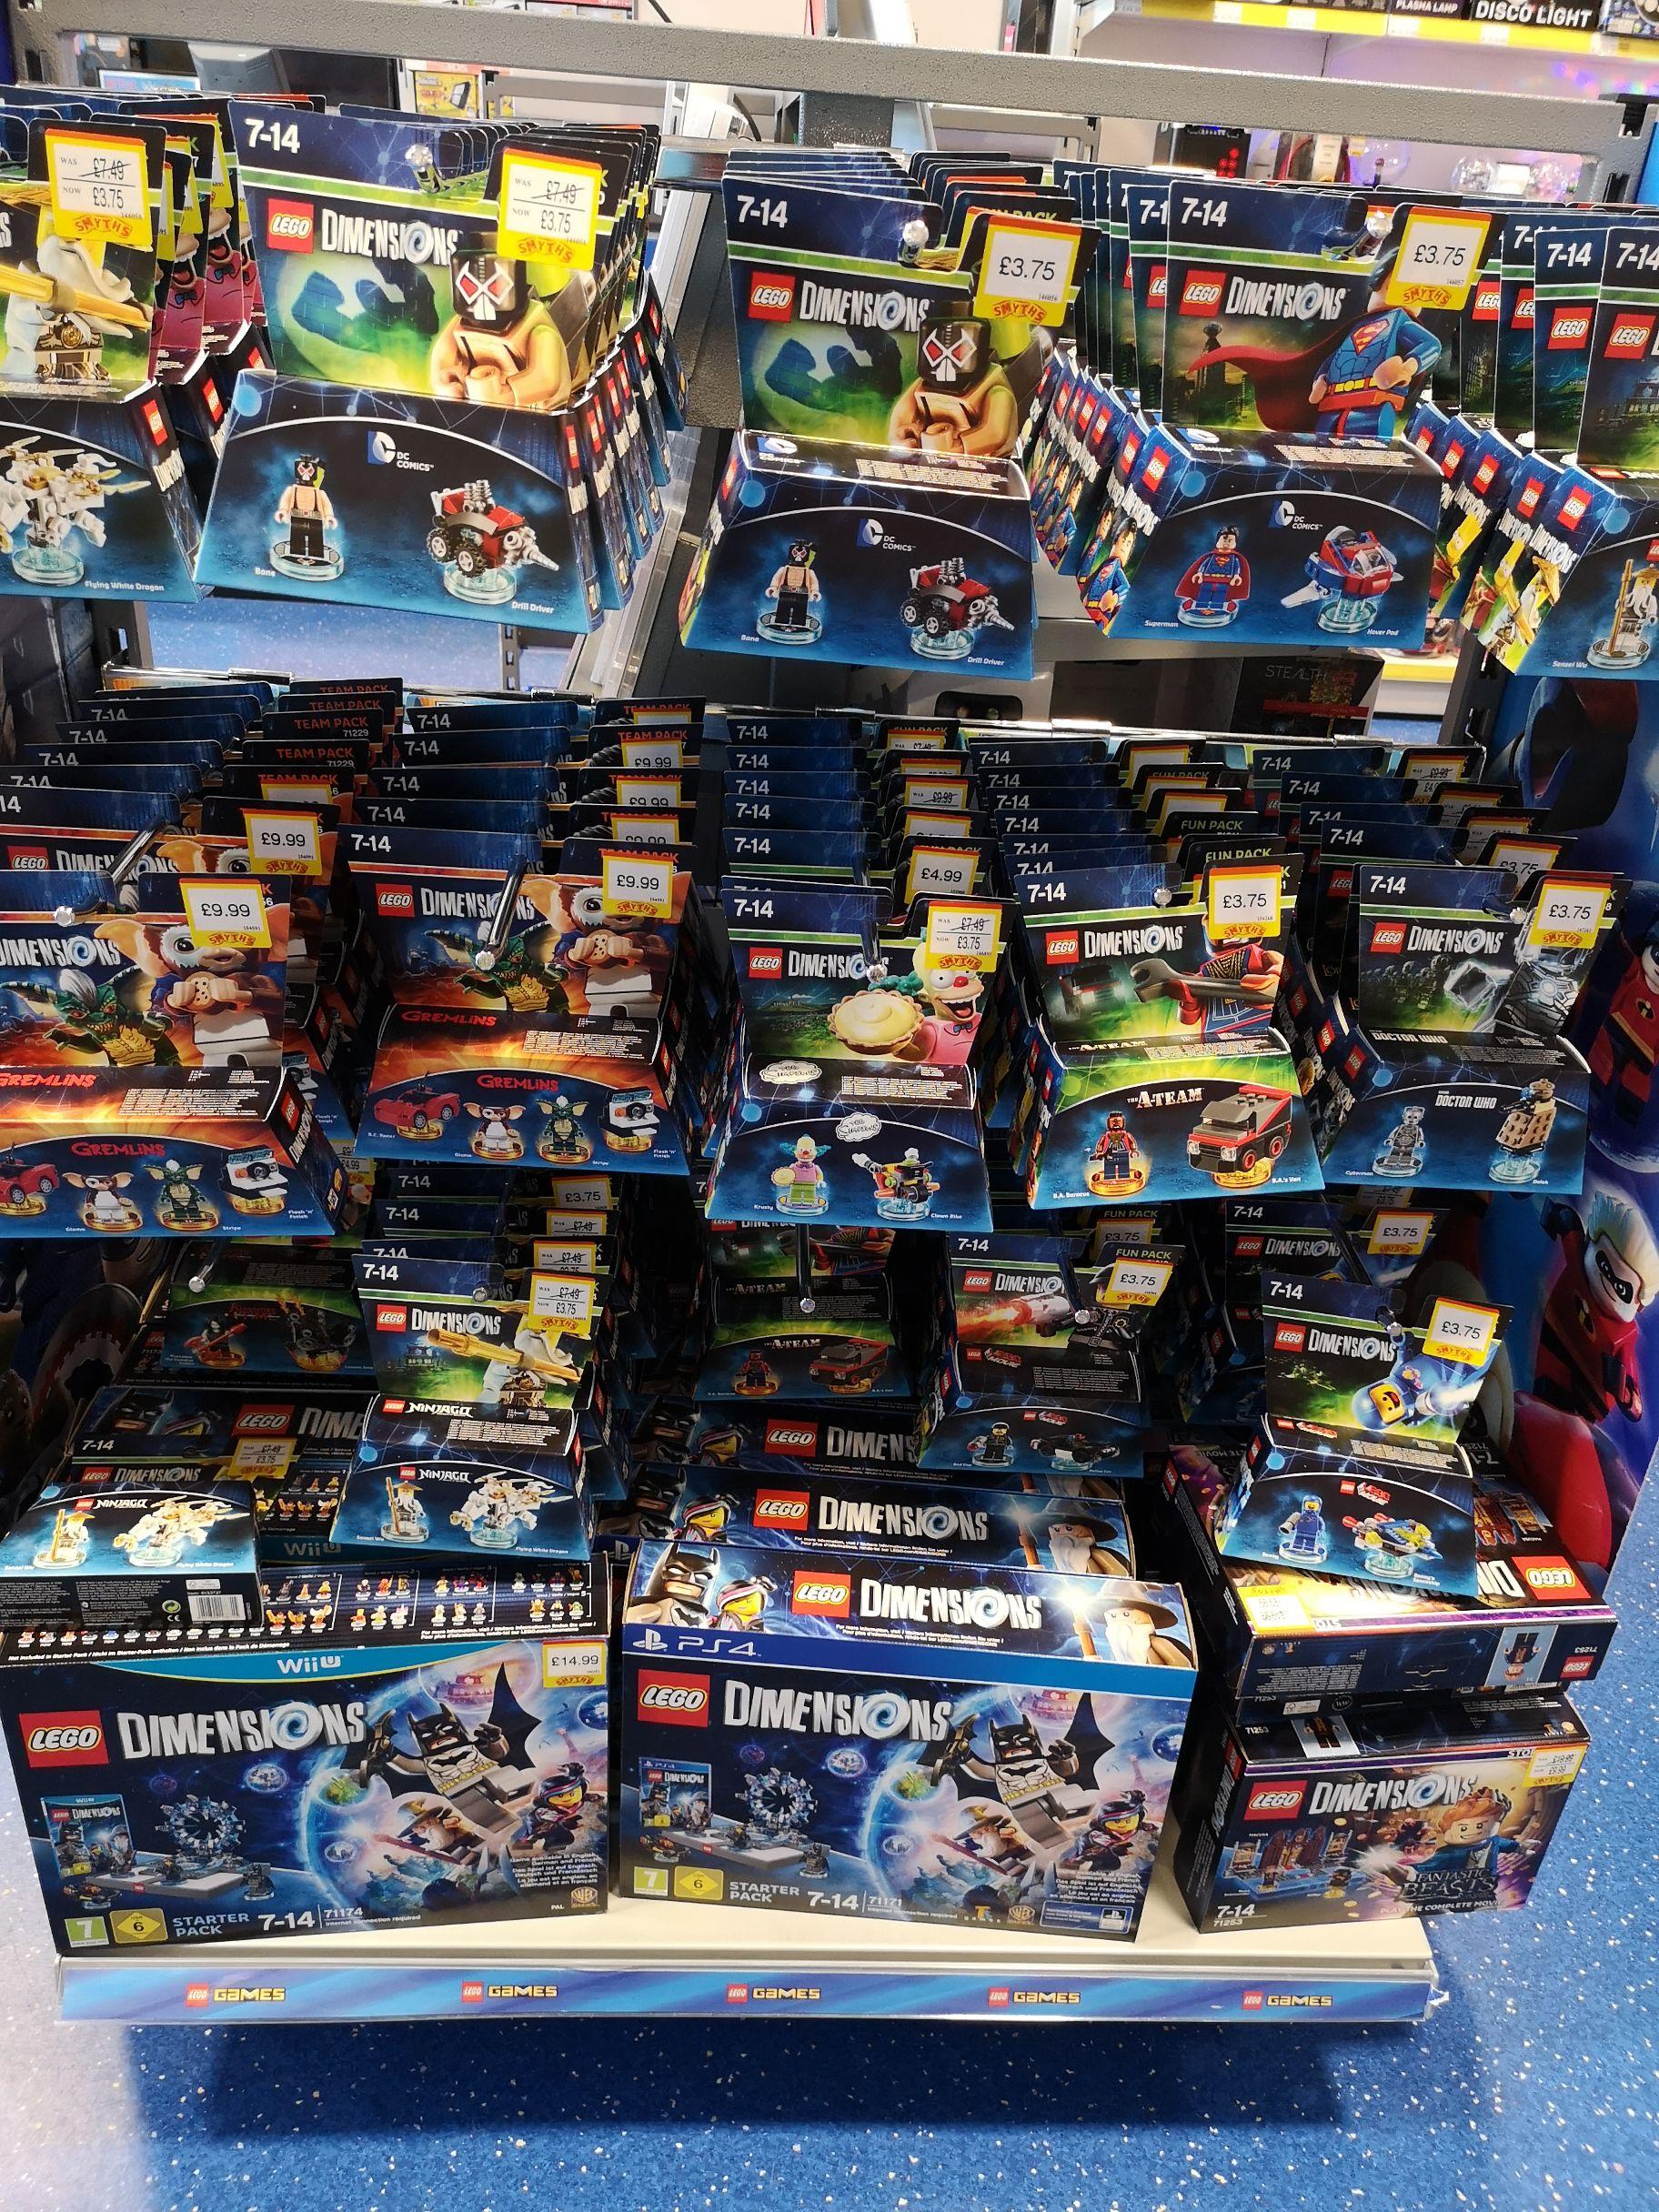 Lego dimensions £3.75 Smyths toys instore